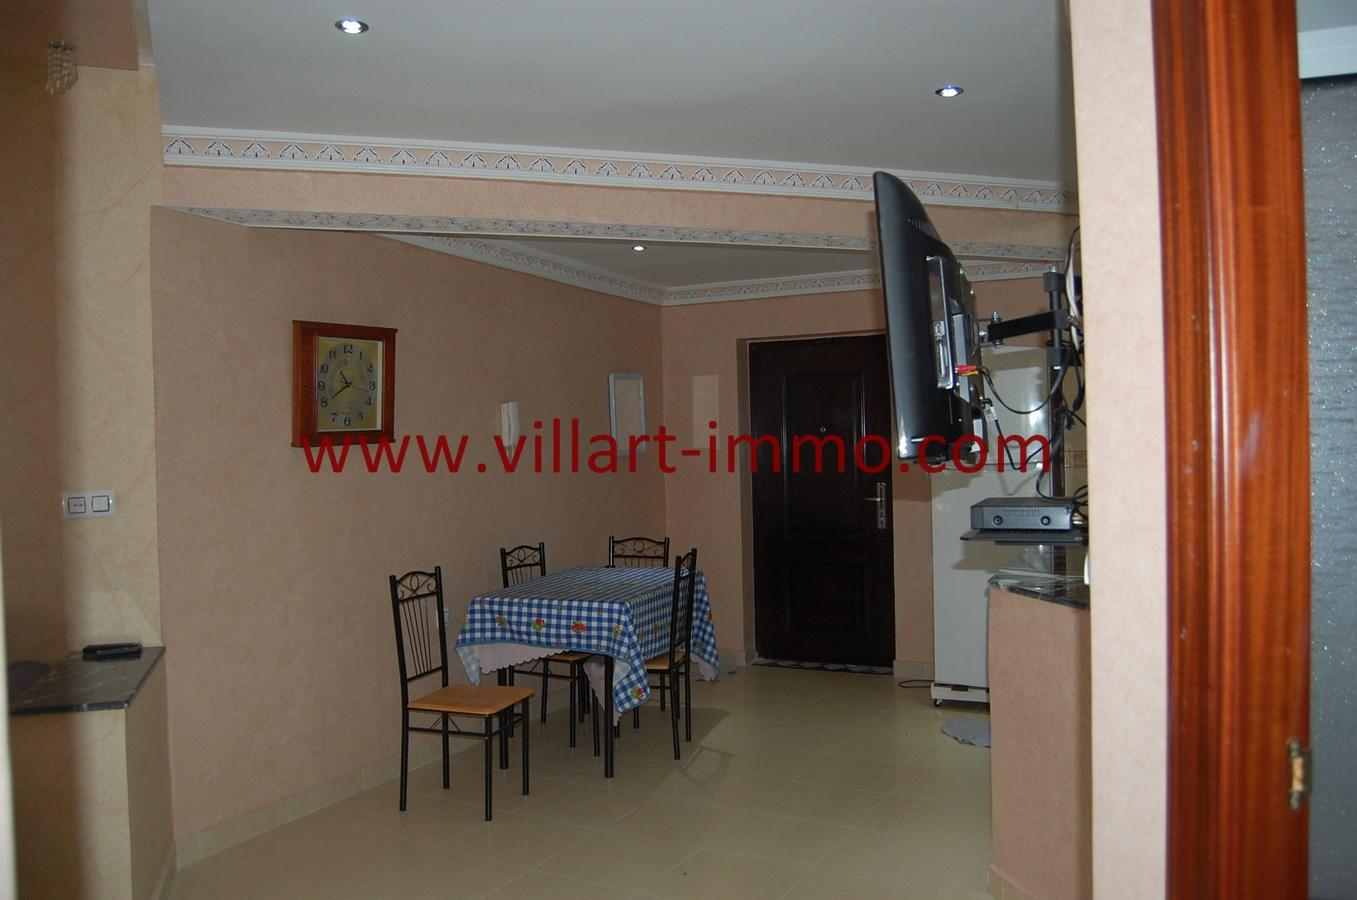 2-Vente-Appartement-Tanger-Malabata-Séjour-VA486-Villart Immo